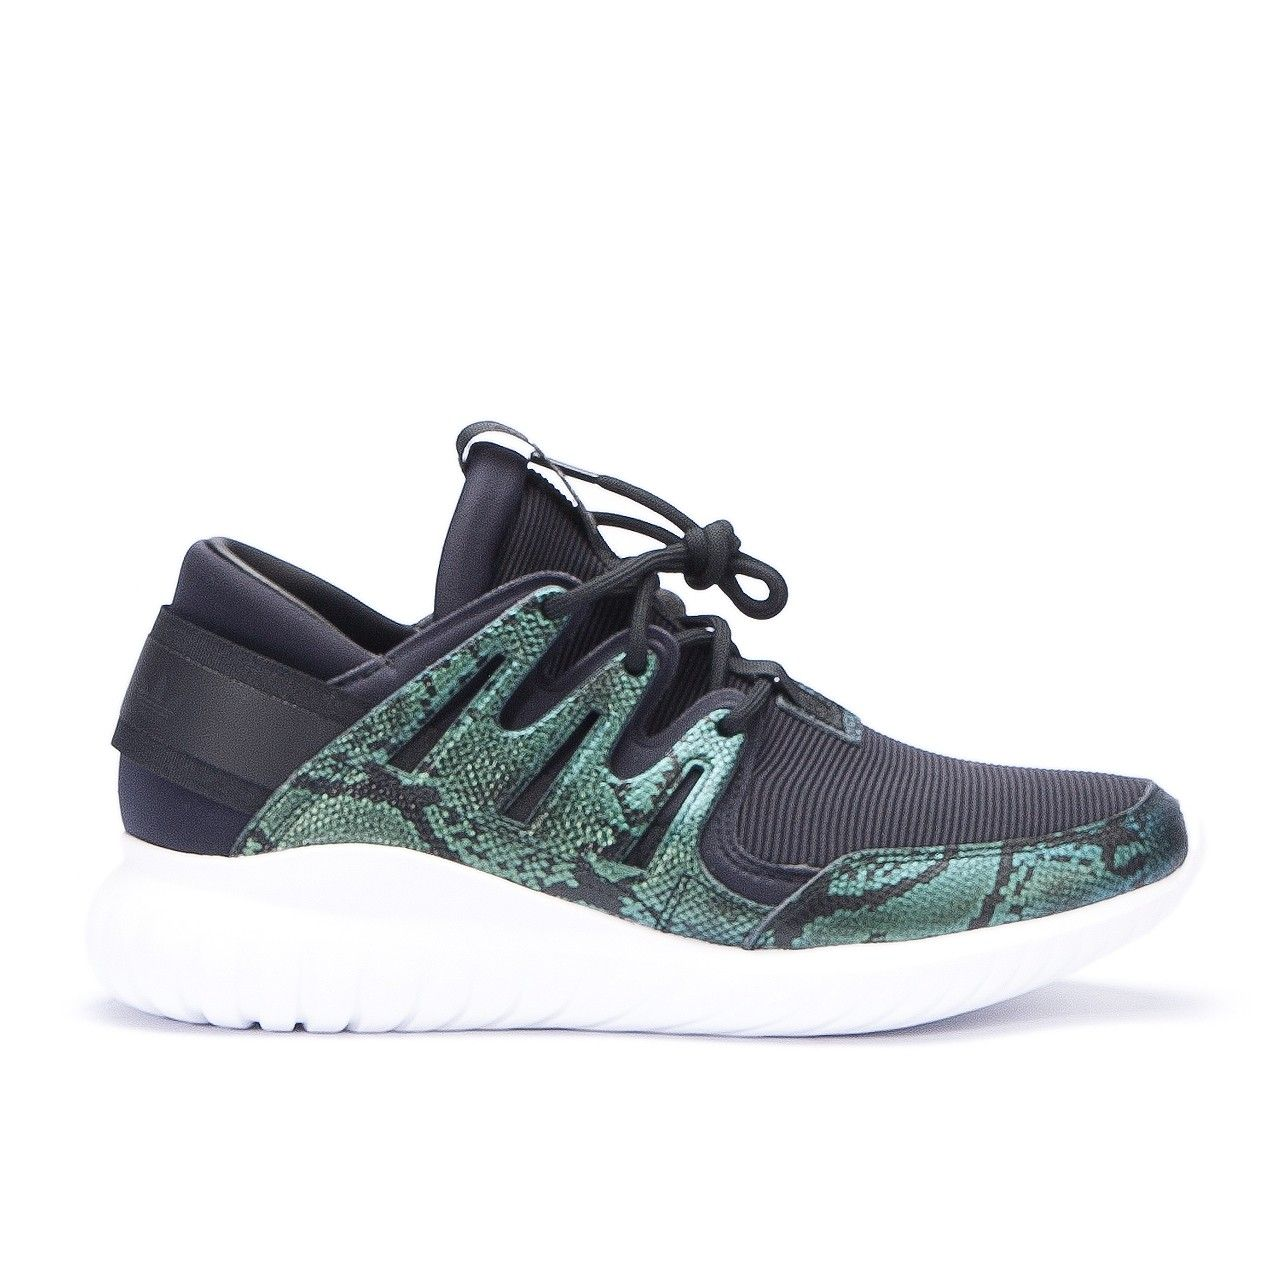 adidas bz0641   unisexe adidas eqt soutenir adv chaussures d'hiver   adidas